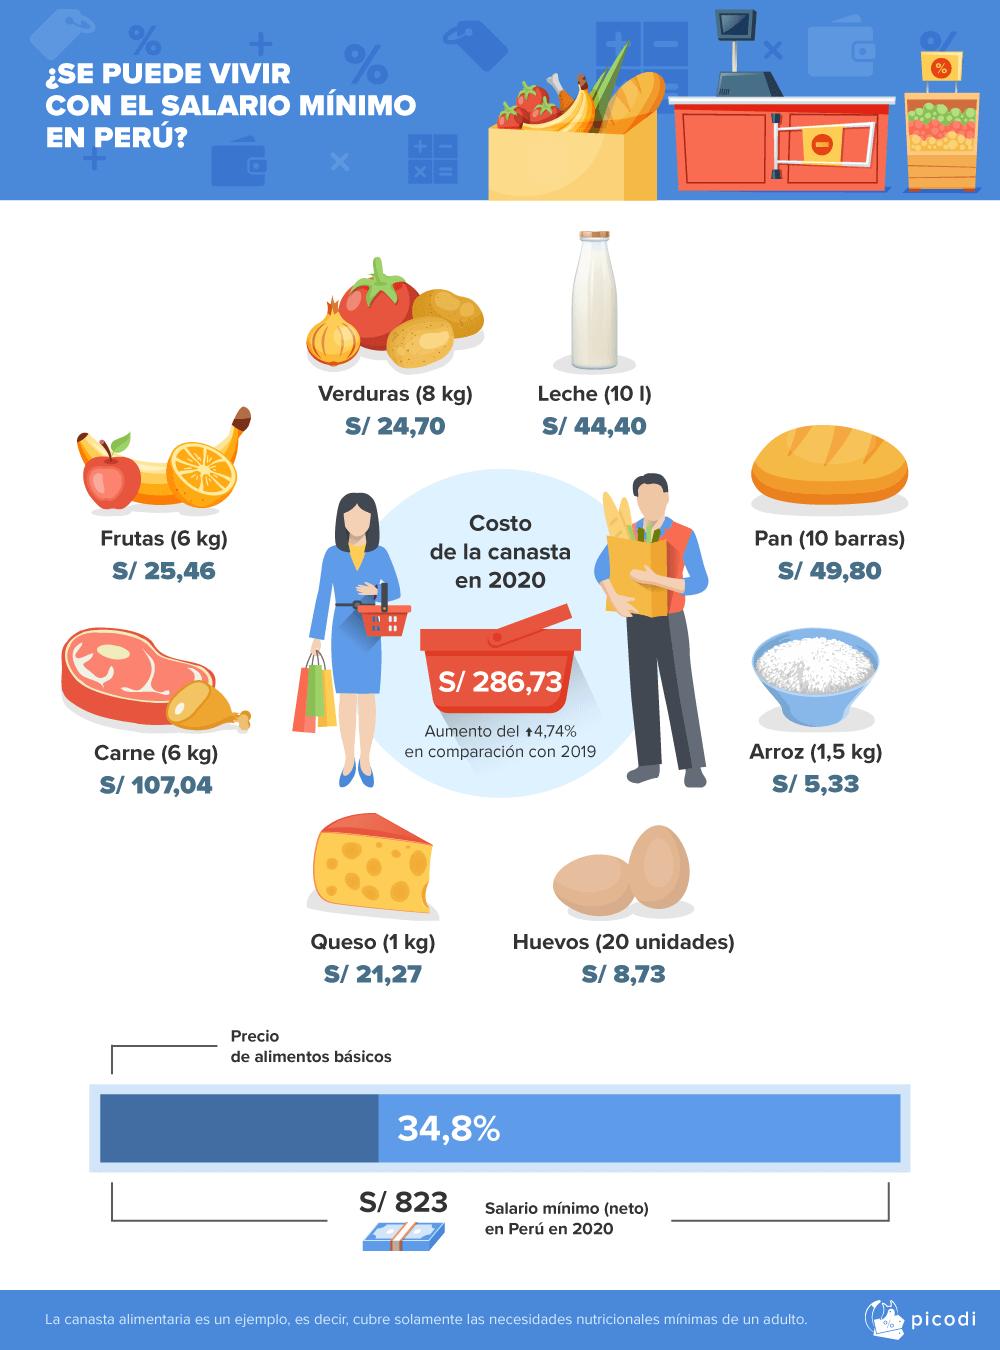 salario-minimo-peru-canasta-basica